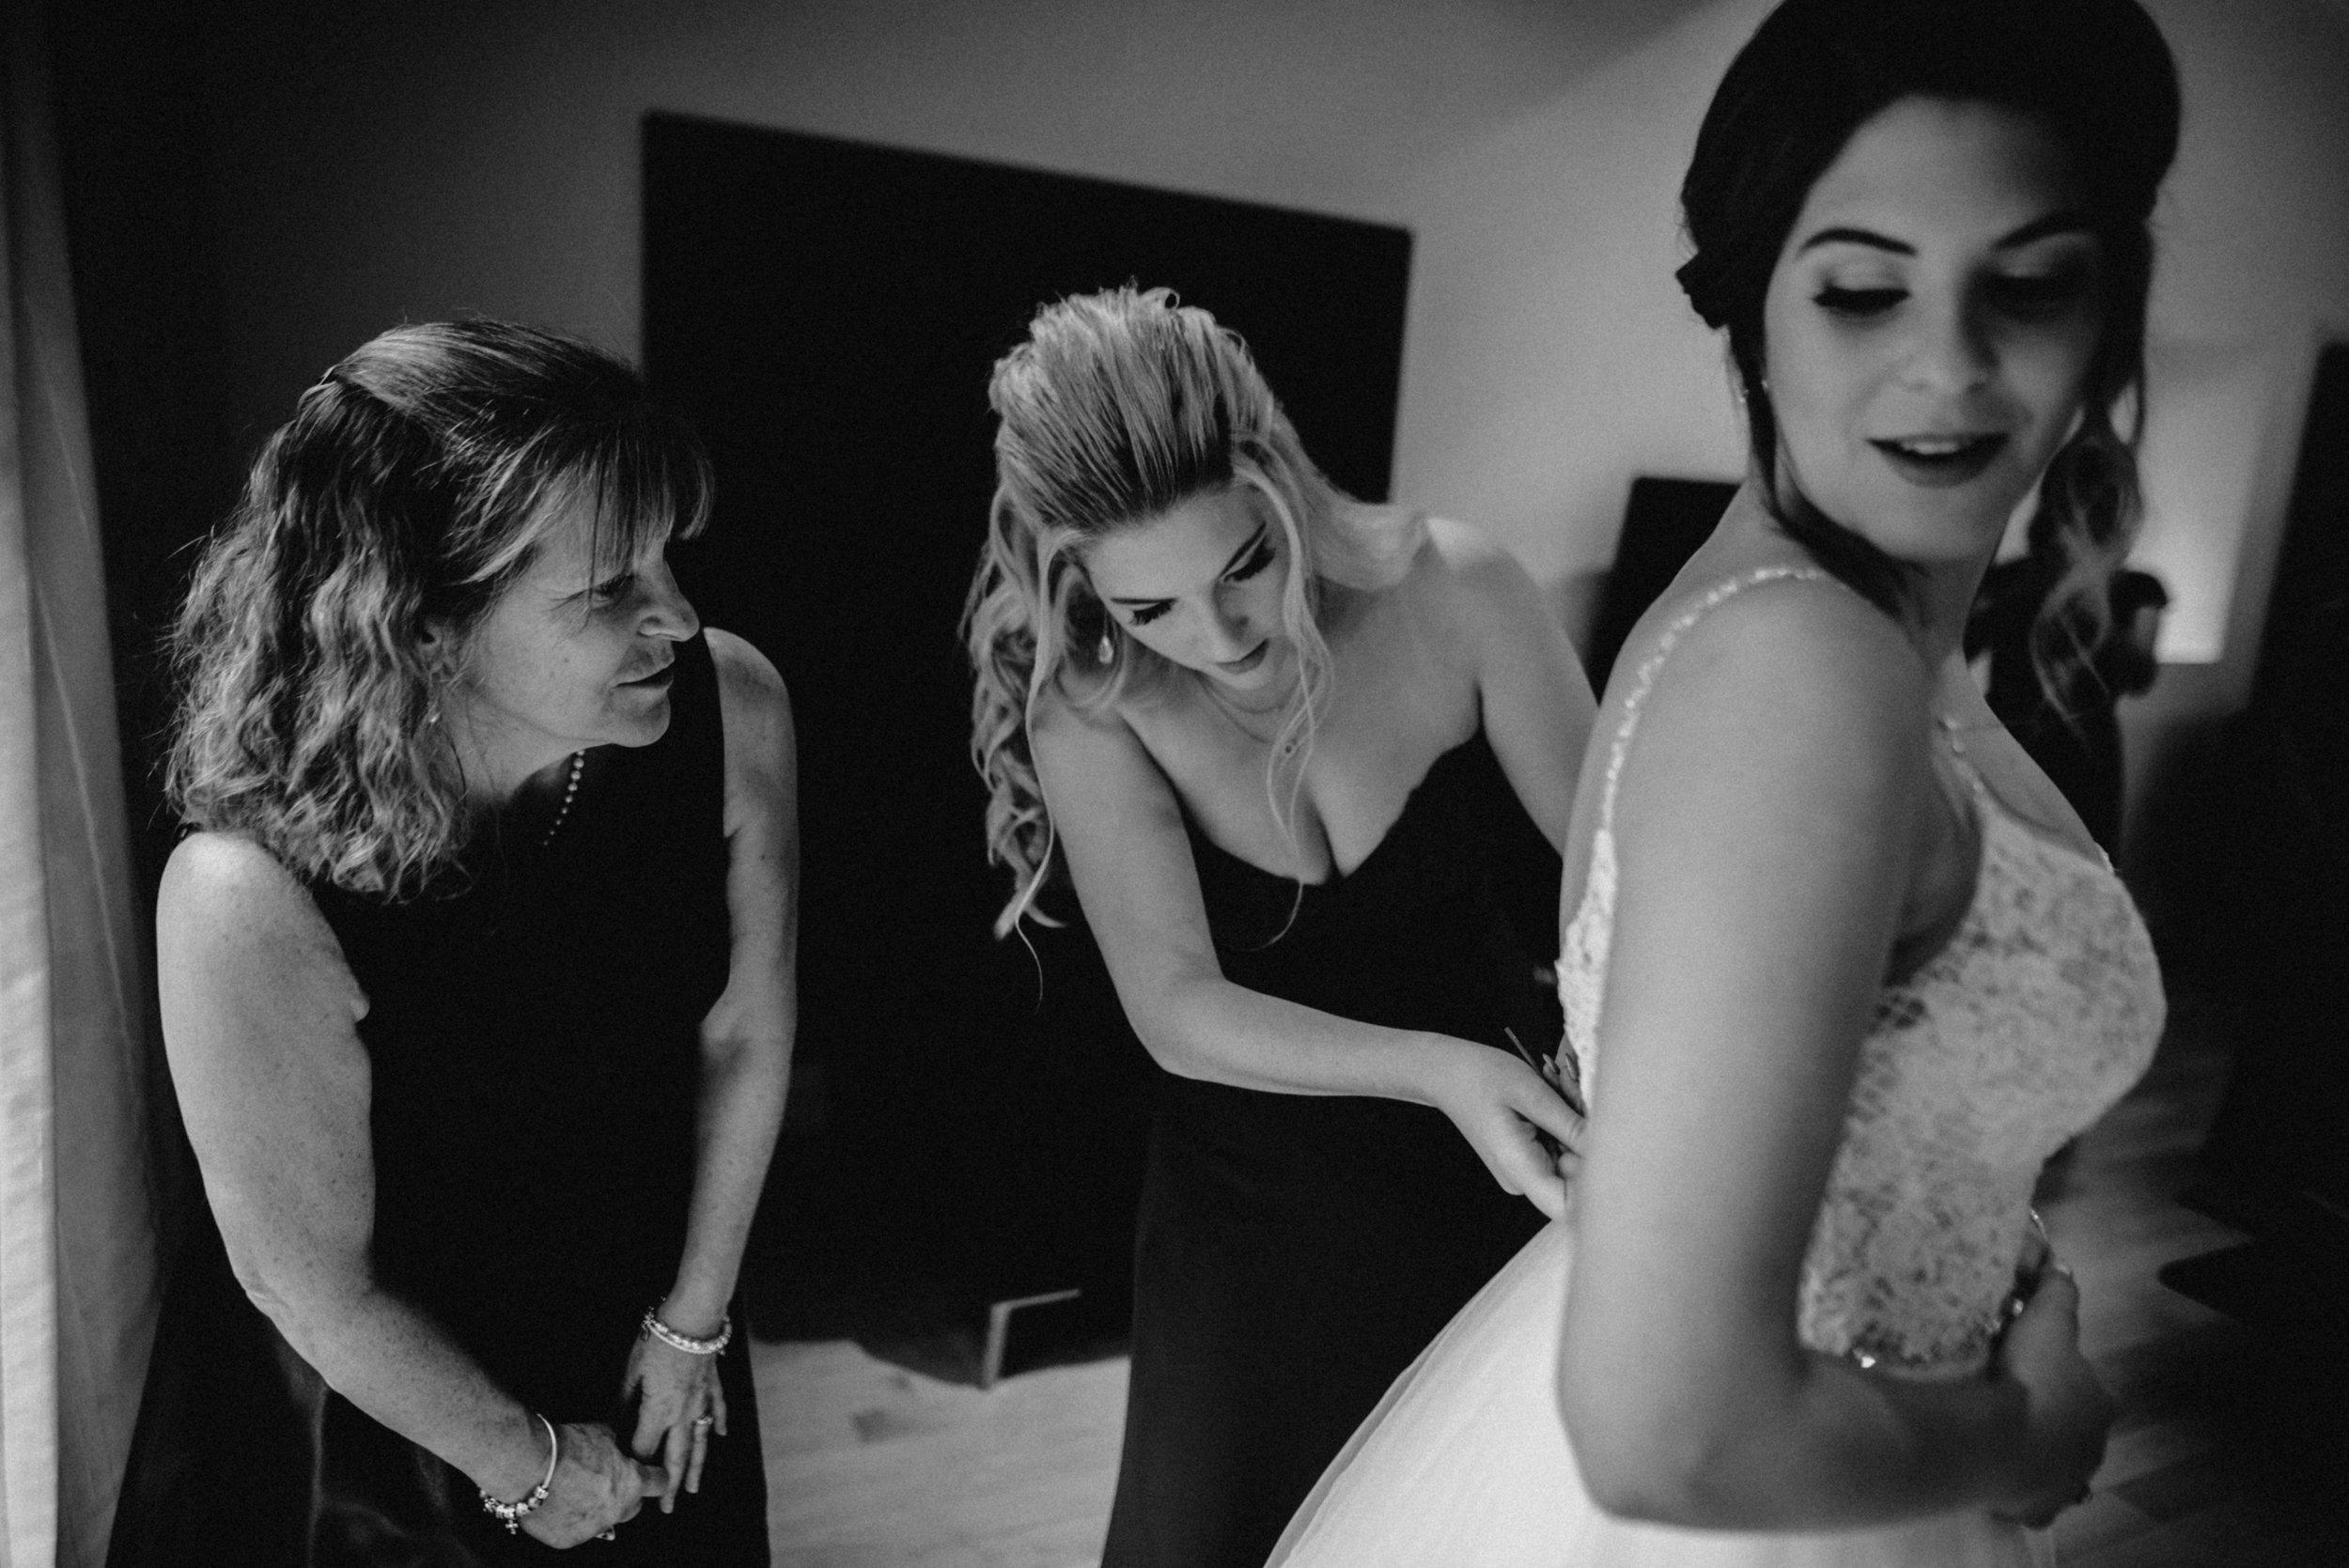 photographe_gatineau_mariage_ottawa_photographer_wedding_natasha_liard_photo_documentary_candid_lifestyle_wakefield_mill_red_bridge (12).jpg